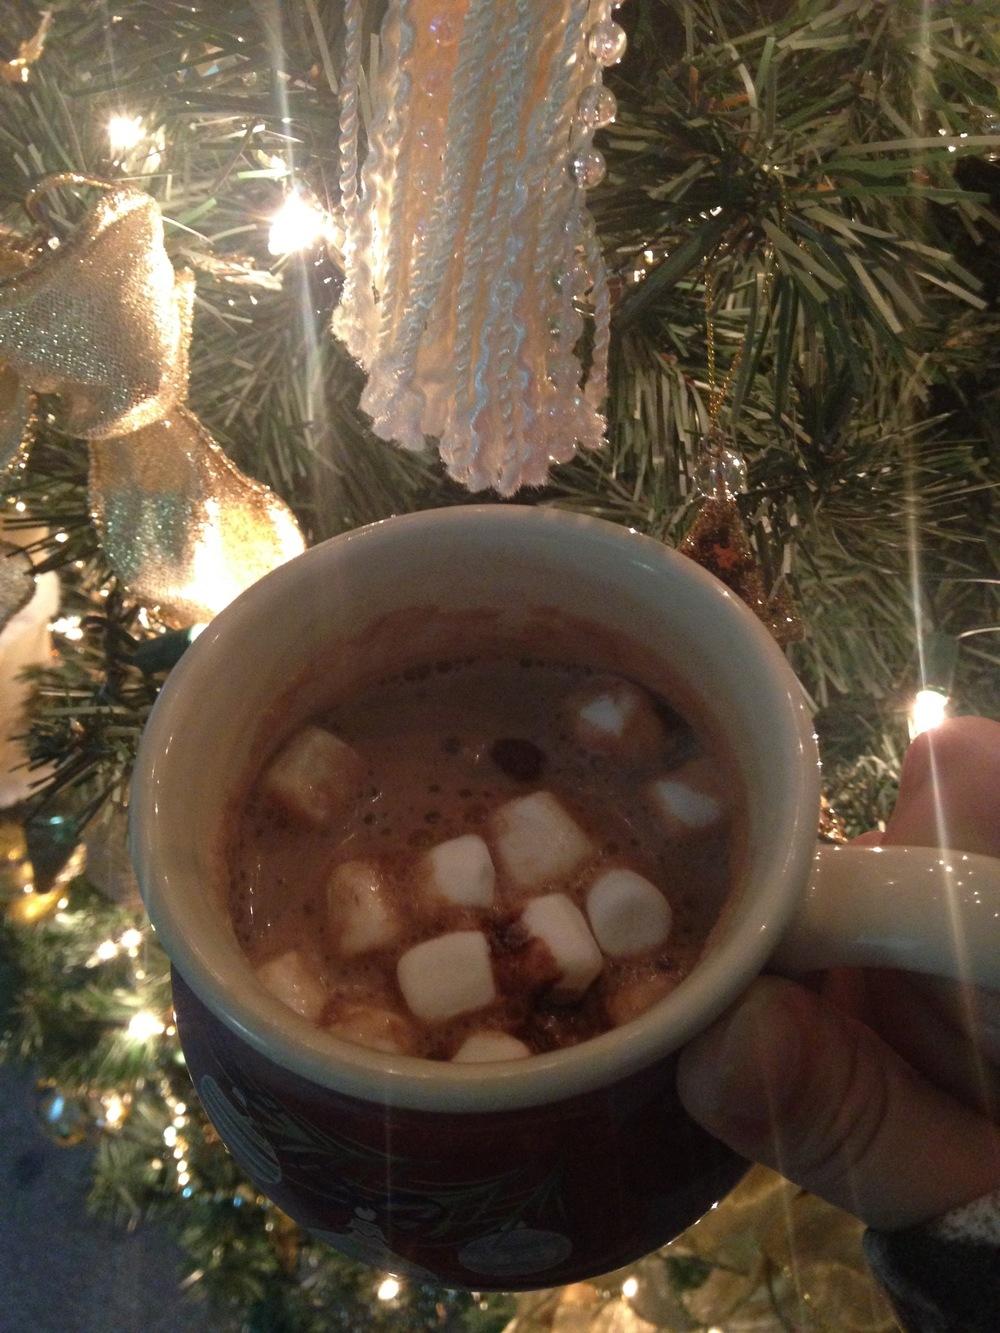 Hot-Chocolate-by-Christmas-Tree.jpg